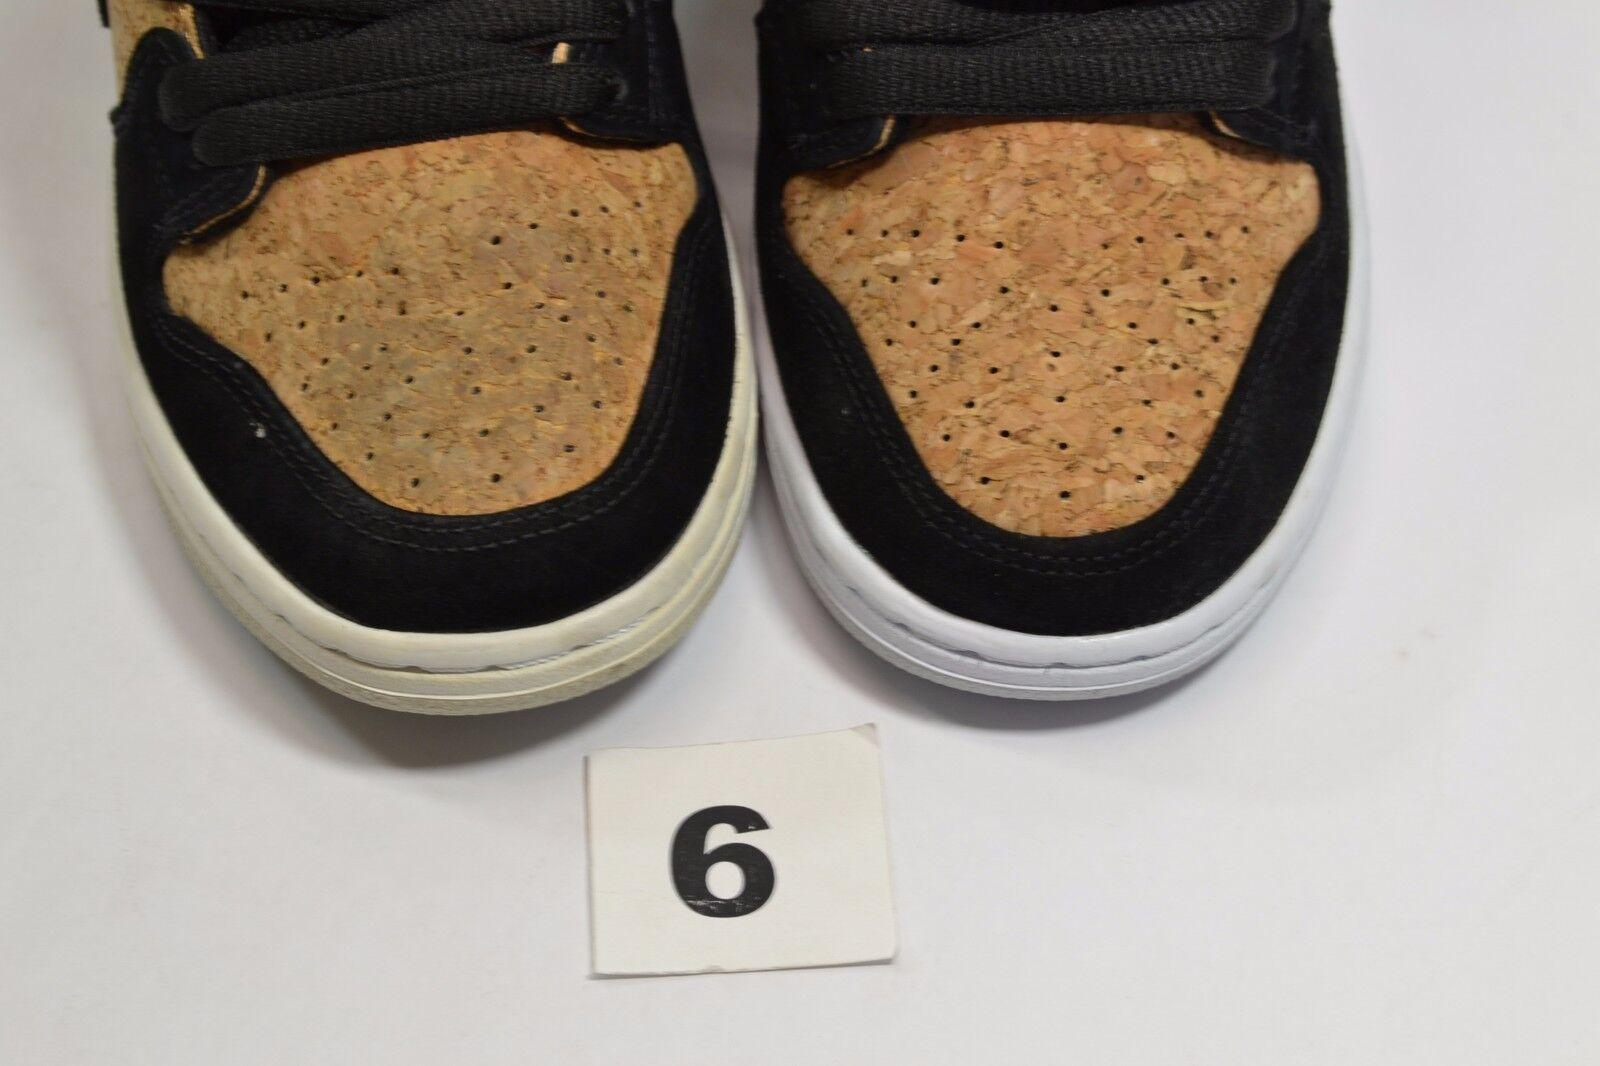 Nike dunk sb schwarz - weiße hohe hohe weiße prämie haselnuss - cork